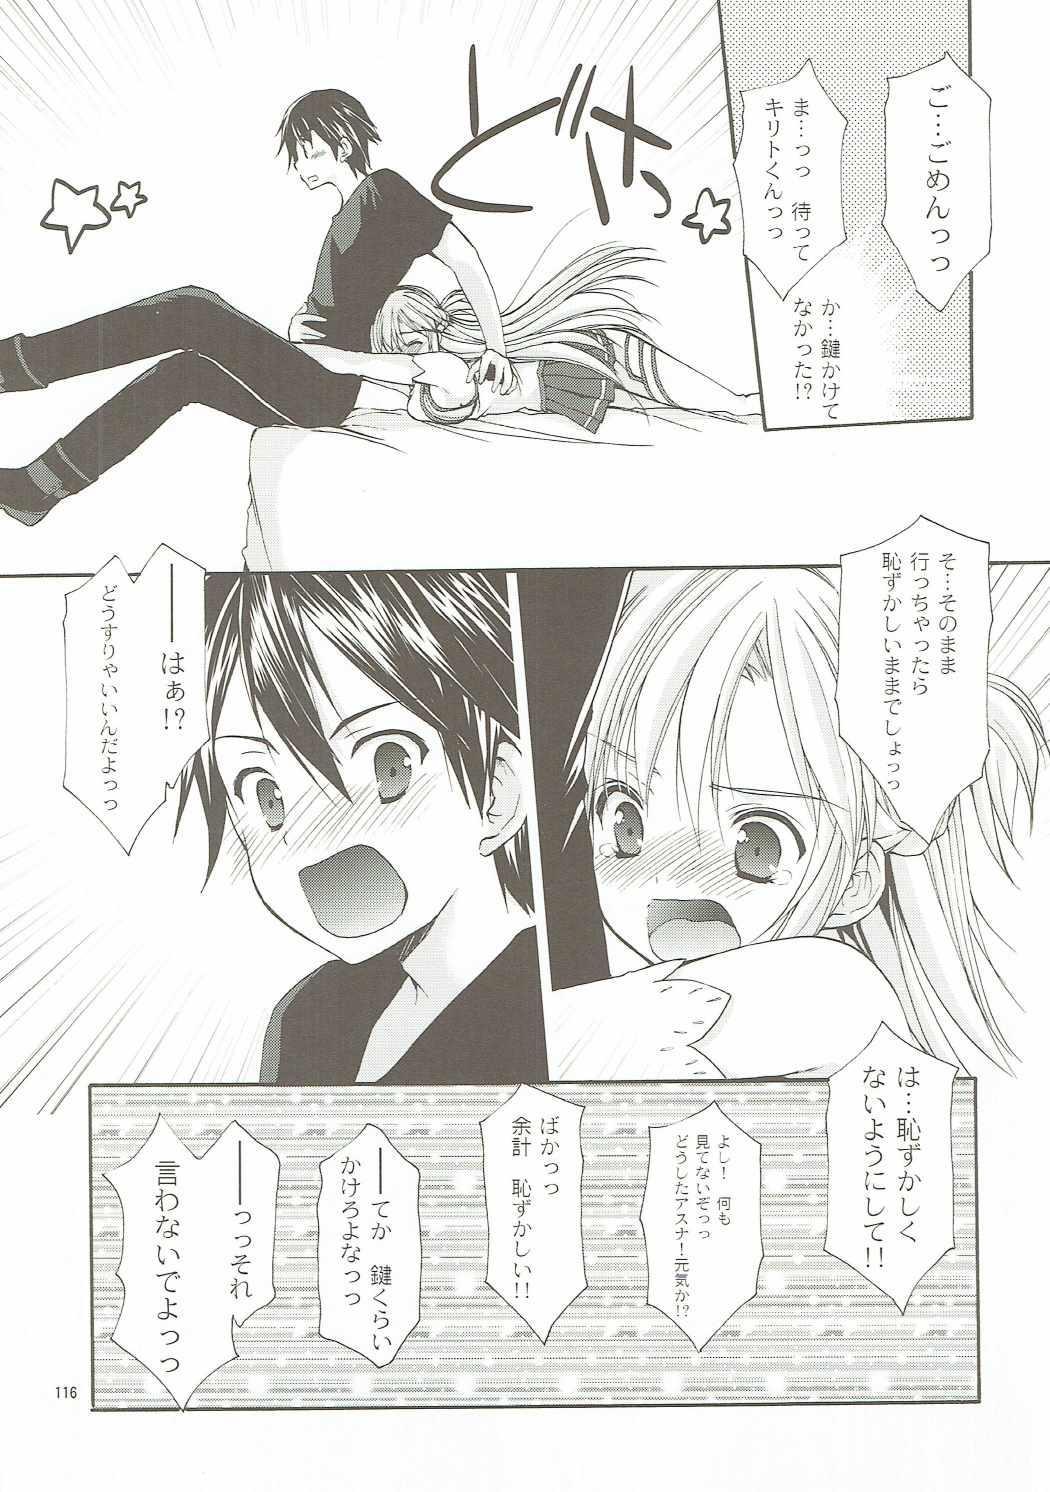 ANIME COLLECTION Imomuya Honpo - Singleton Anime Soushuuhen 114